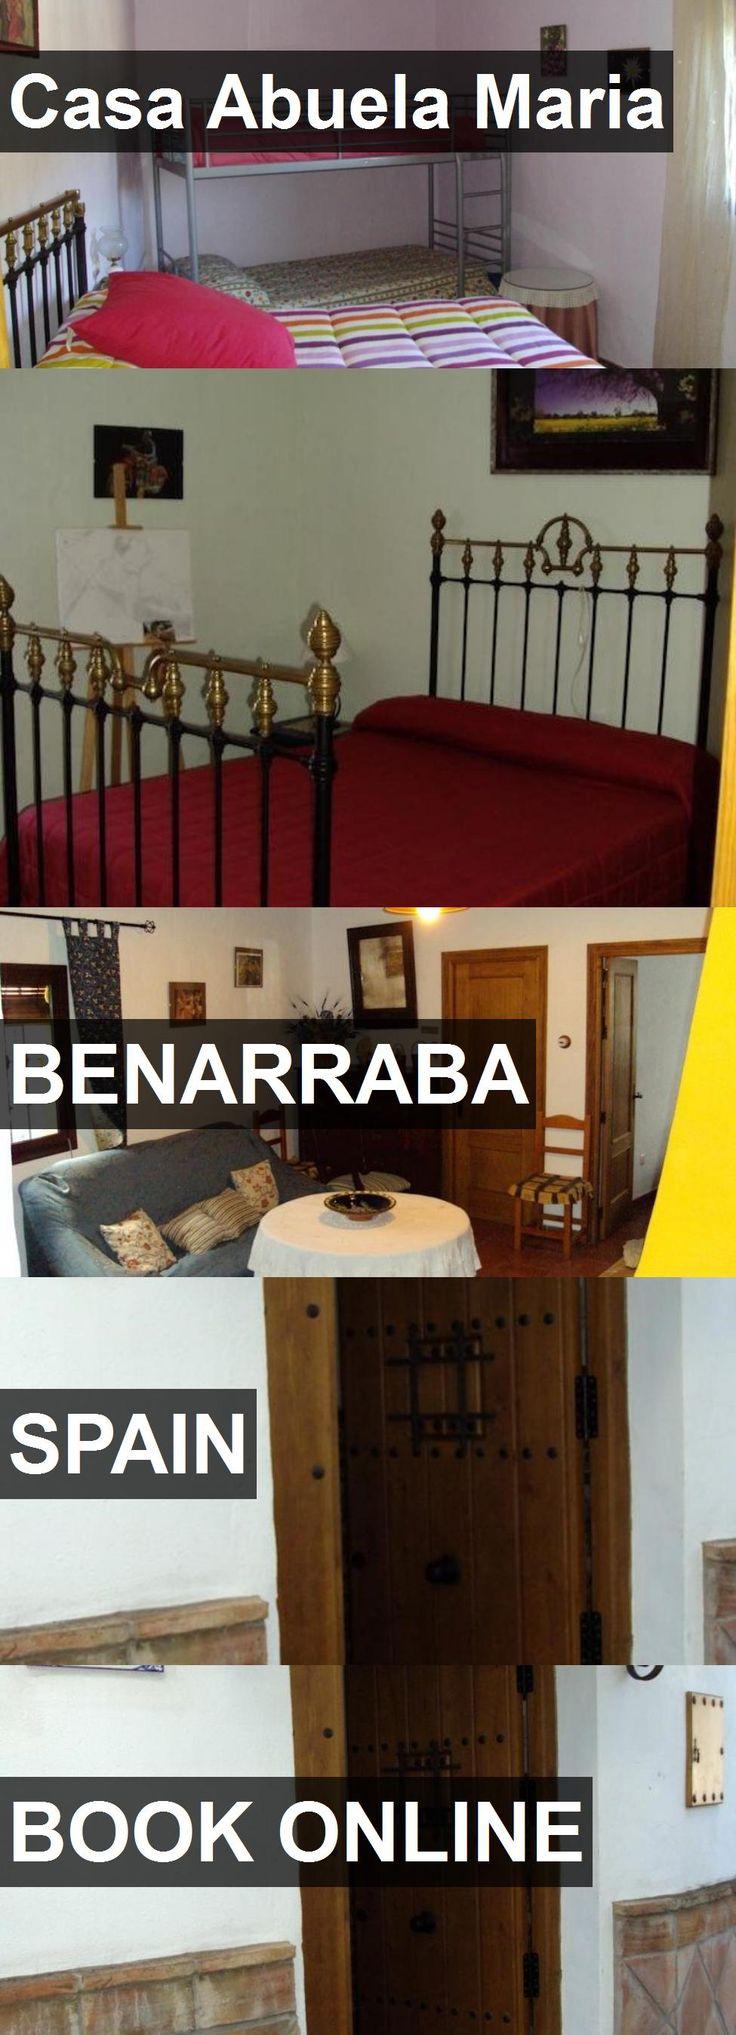 Hotel Casa Abuela Maria in Benarraba, Spain. For more information, photos, reviews and best prices please follow the link. #Spain #Benarraba #travel #vacation #hotel